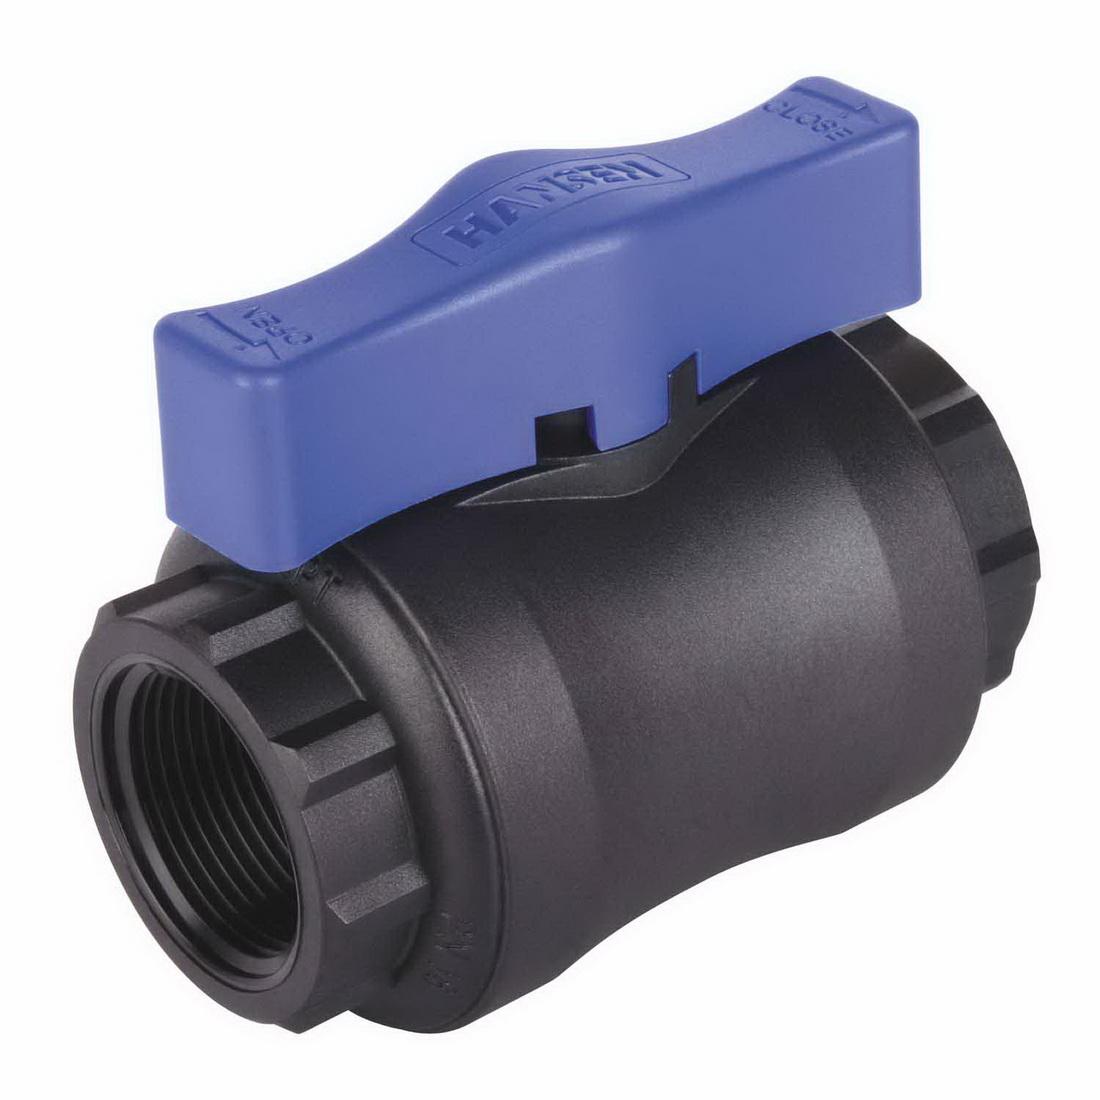 HBV Series Full Flow Compact Ball Valve 32mm F BSPT Glass Fibre Reinforced Nylon Black/Blue